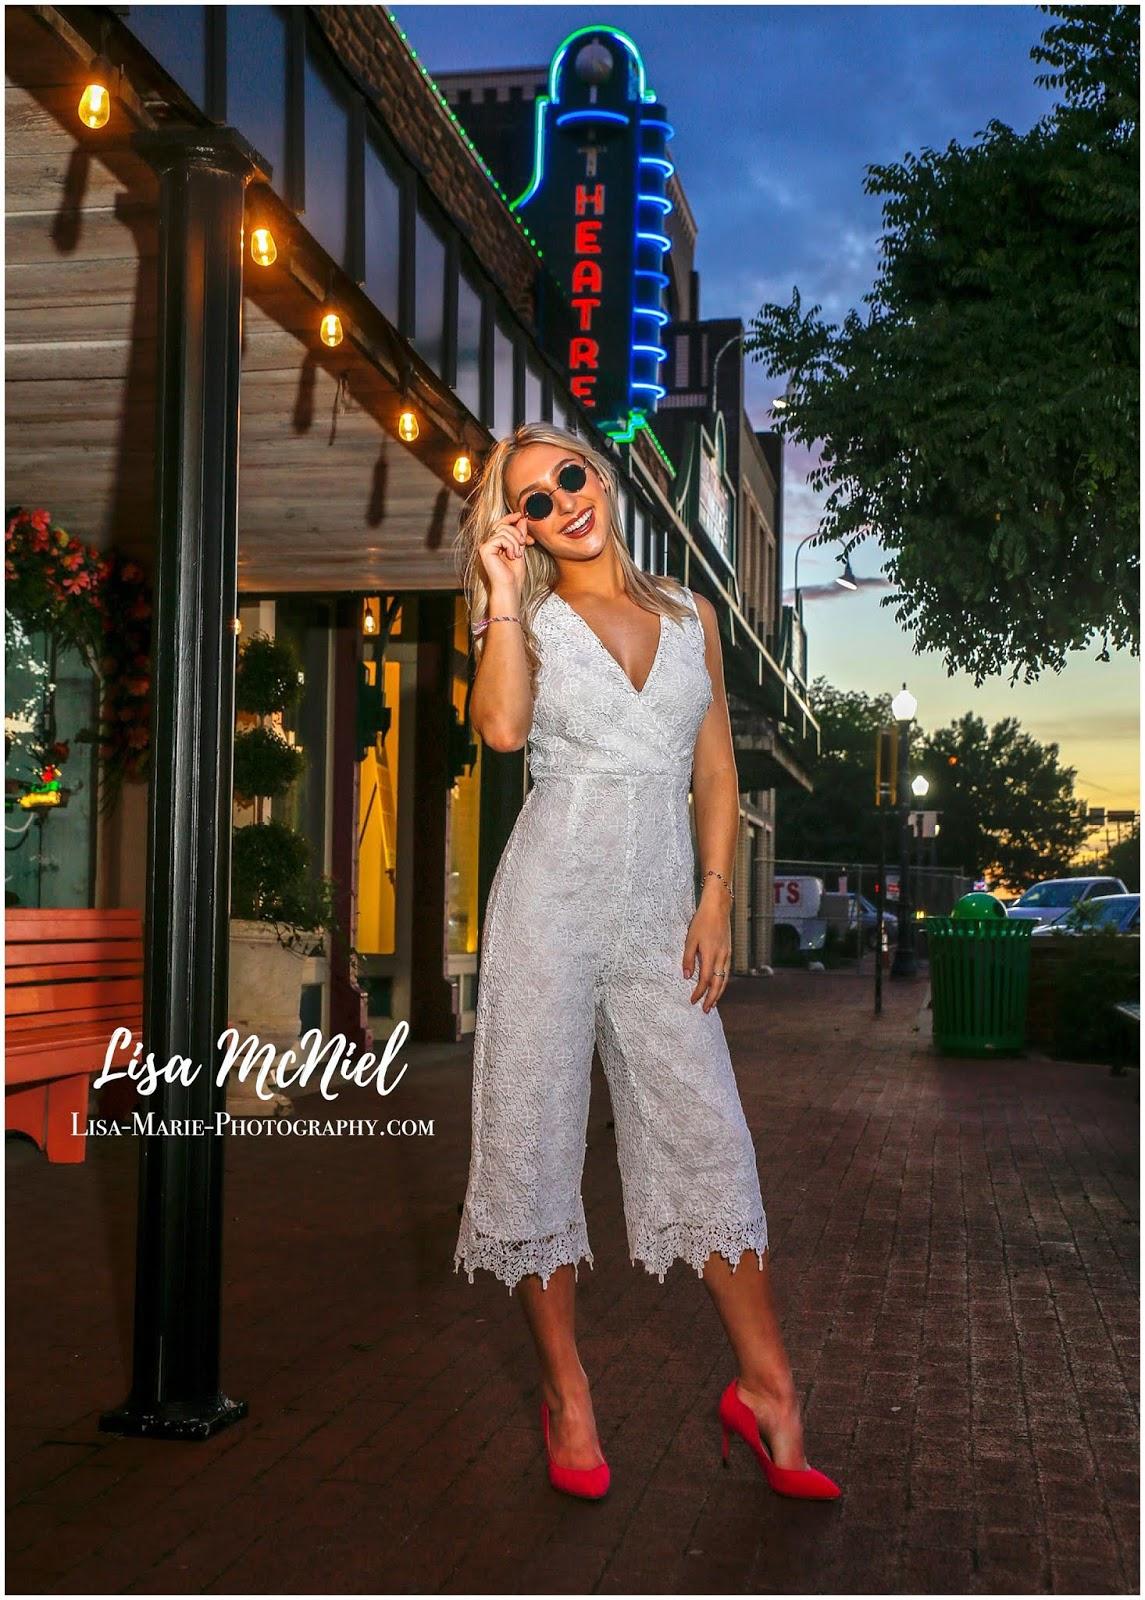 teen girl in vintage town evening